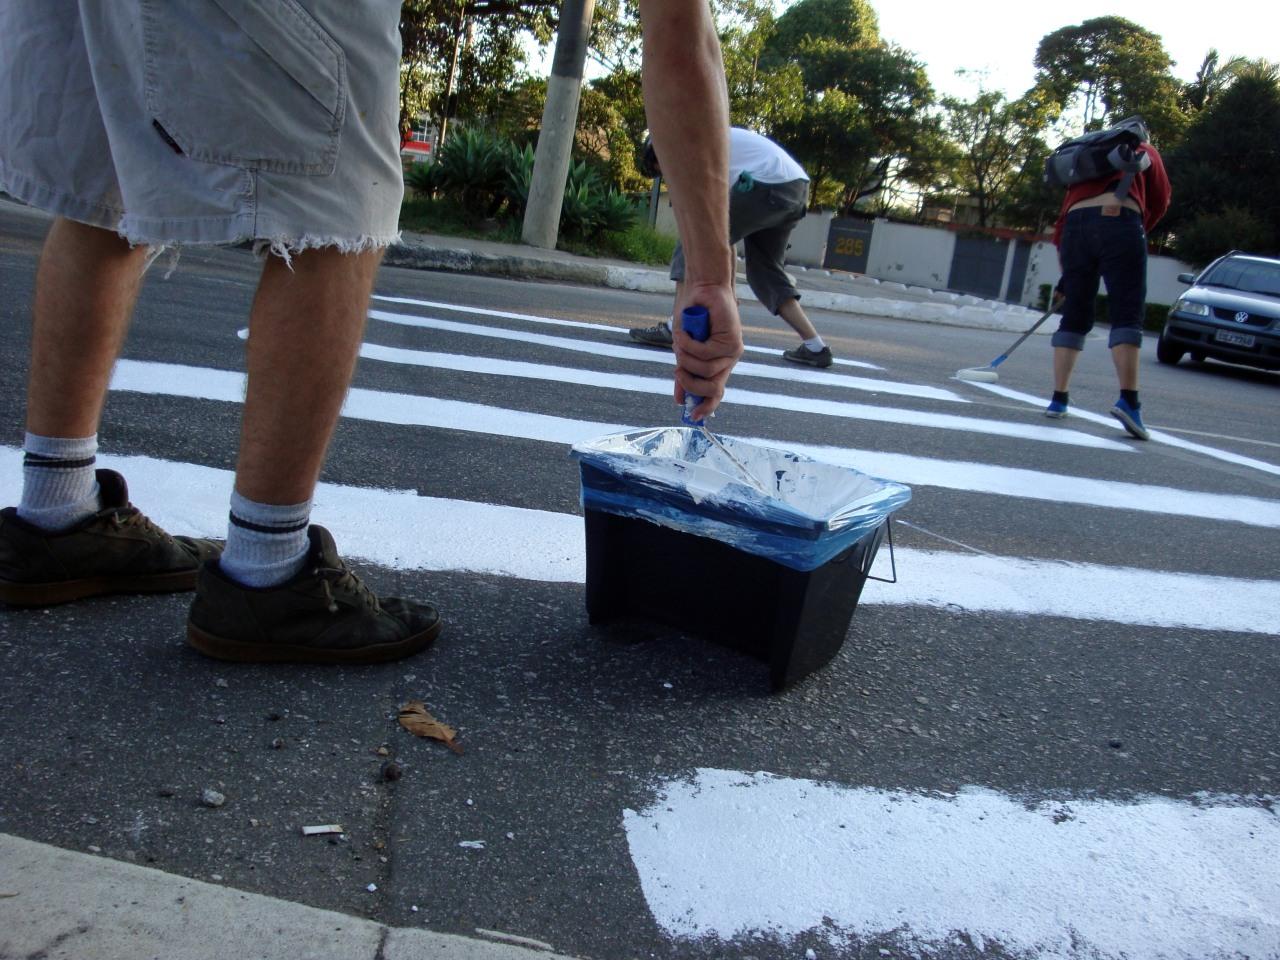 The 'urban repair squad' painted pedestrian a pedestrian crosswalk during the Brazil - North Korea World Cup match. Photo via ApocolipseMotorizado.